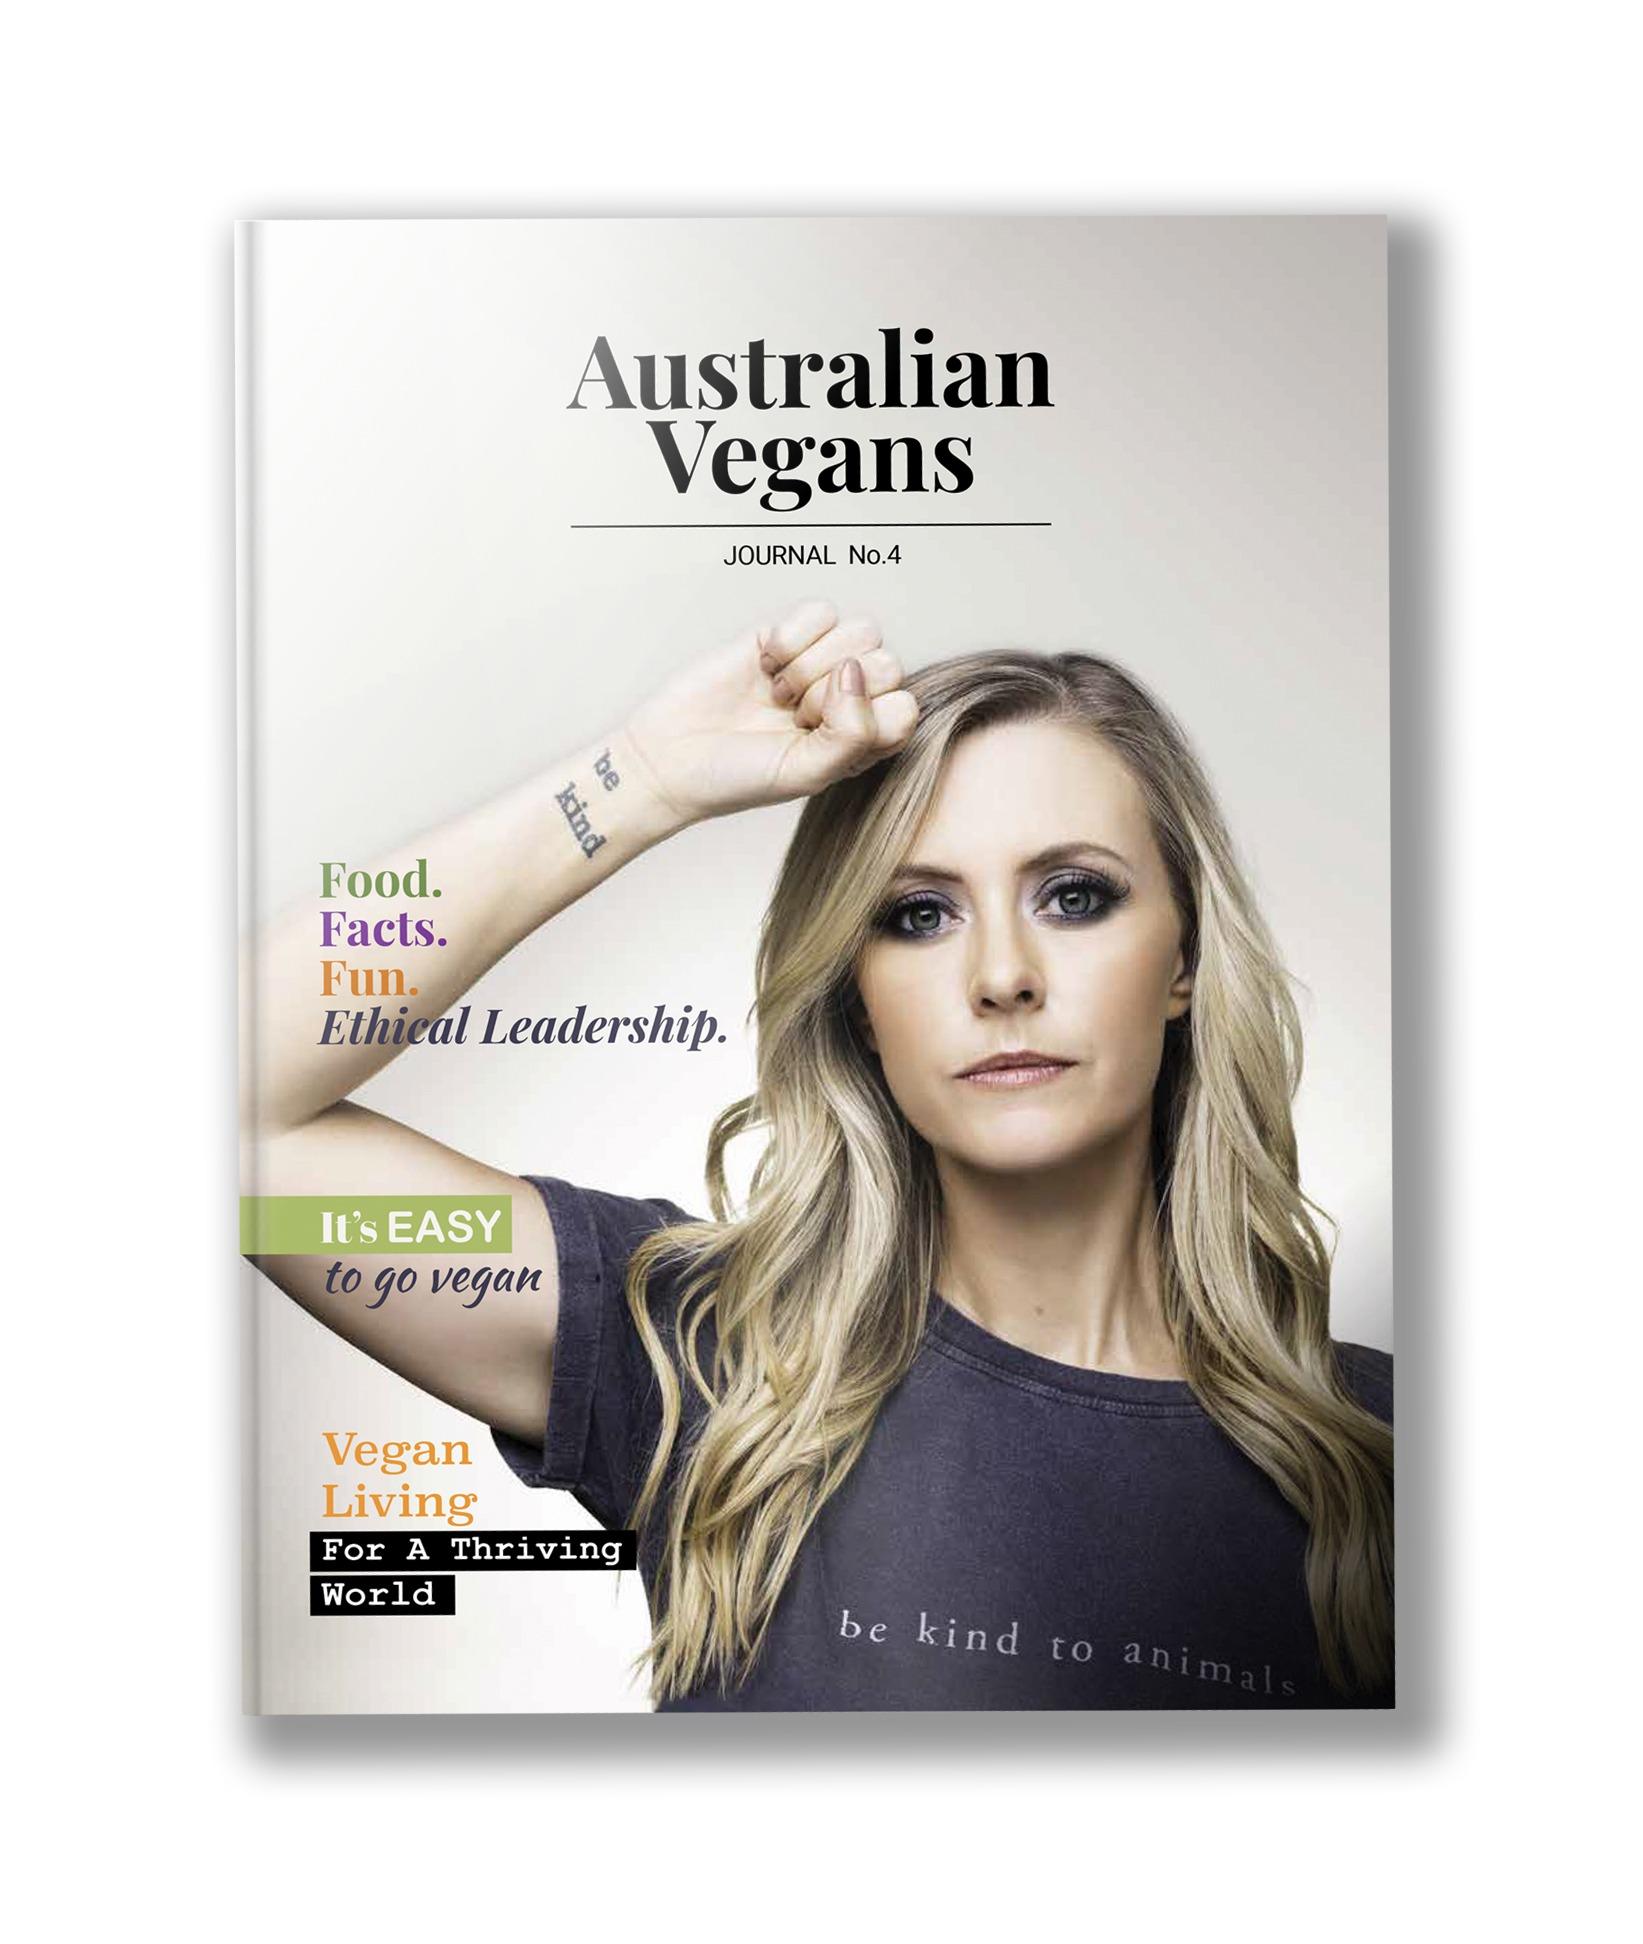 Australian Vegans Journal Vol 4 is out now!